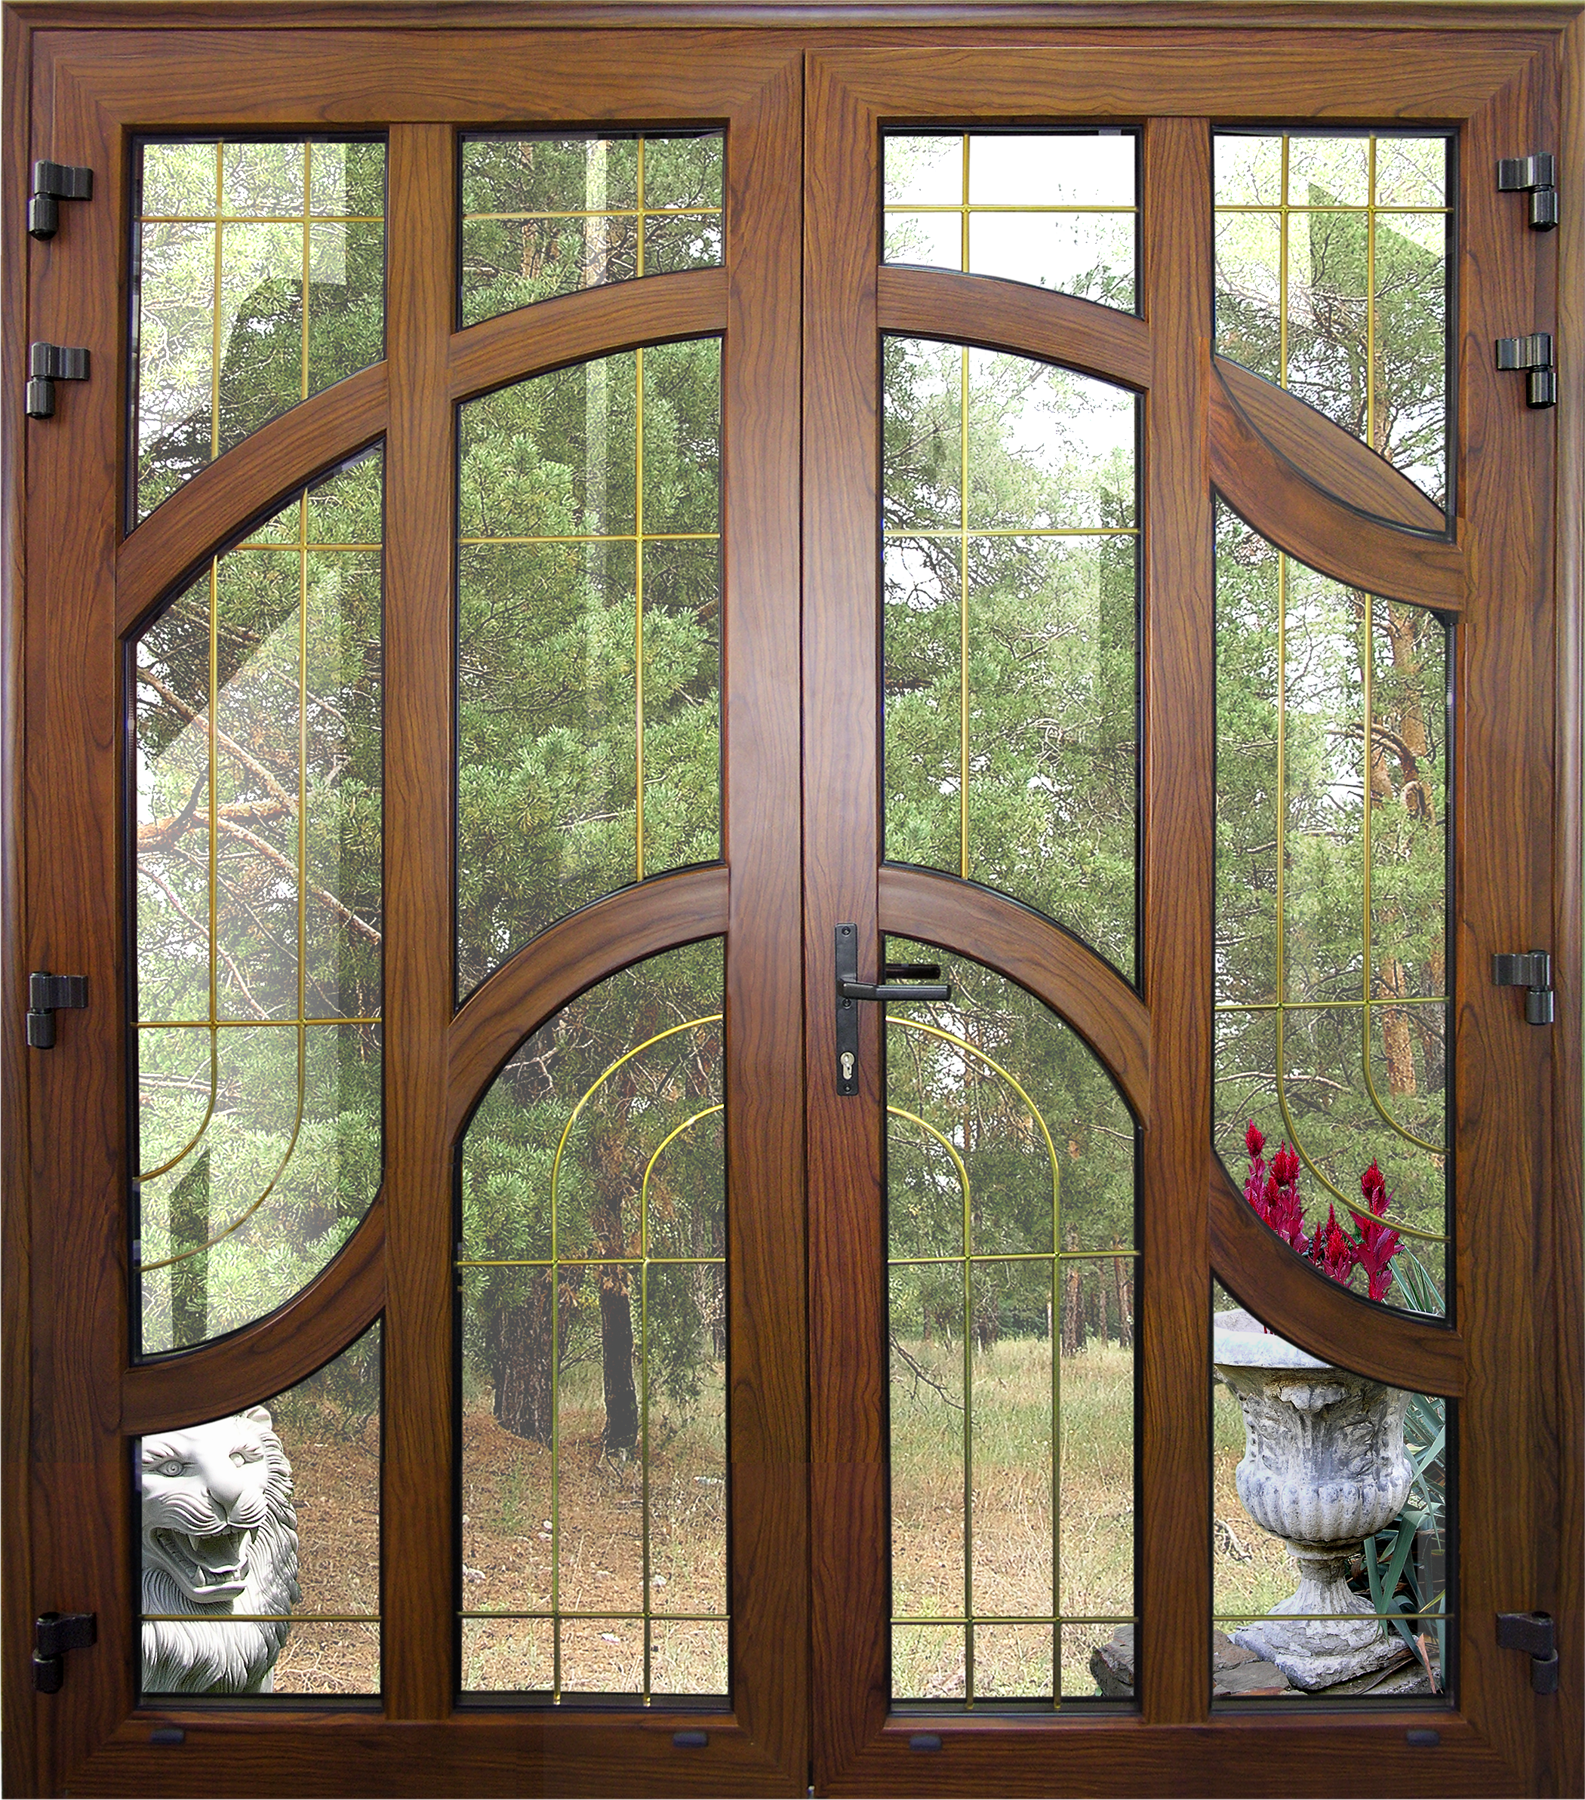 home ideas innovative house design window designs house window - Windows For Houses Design